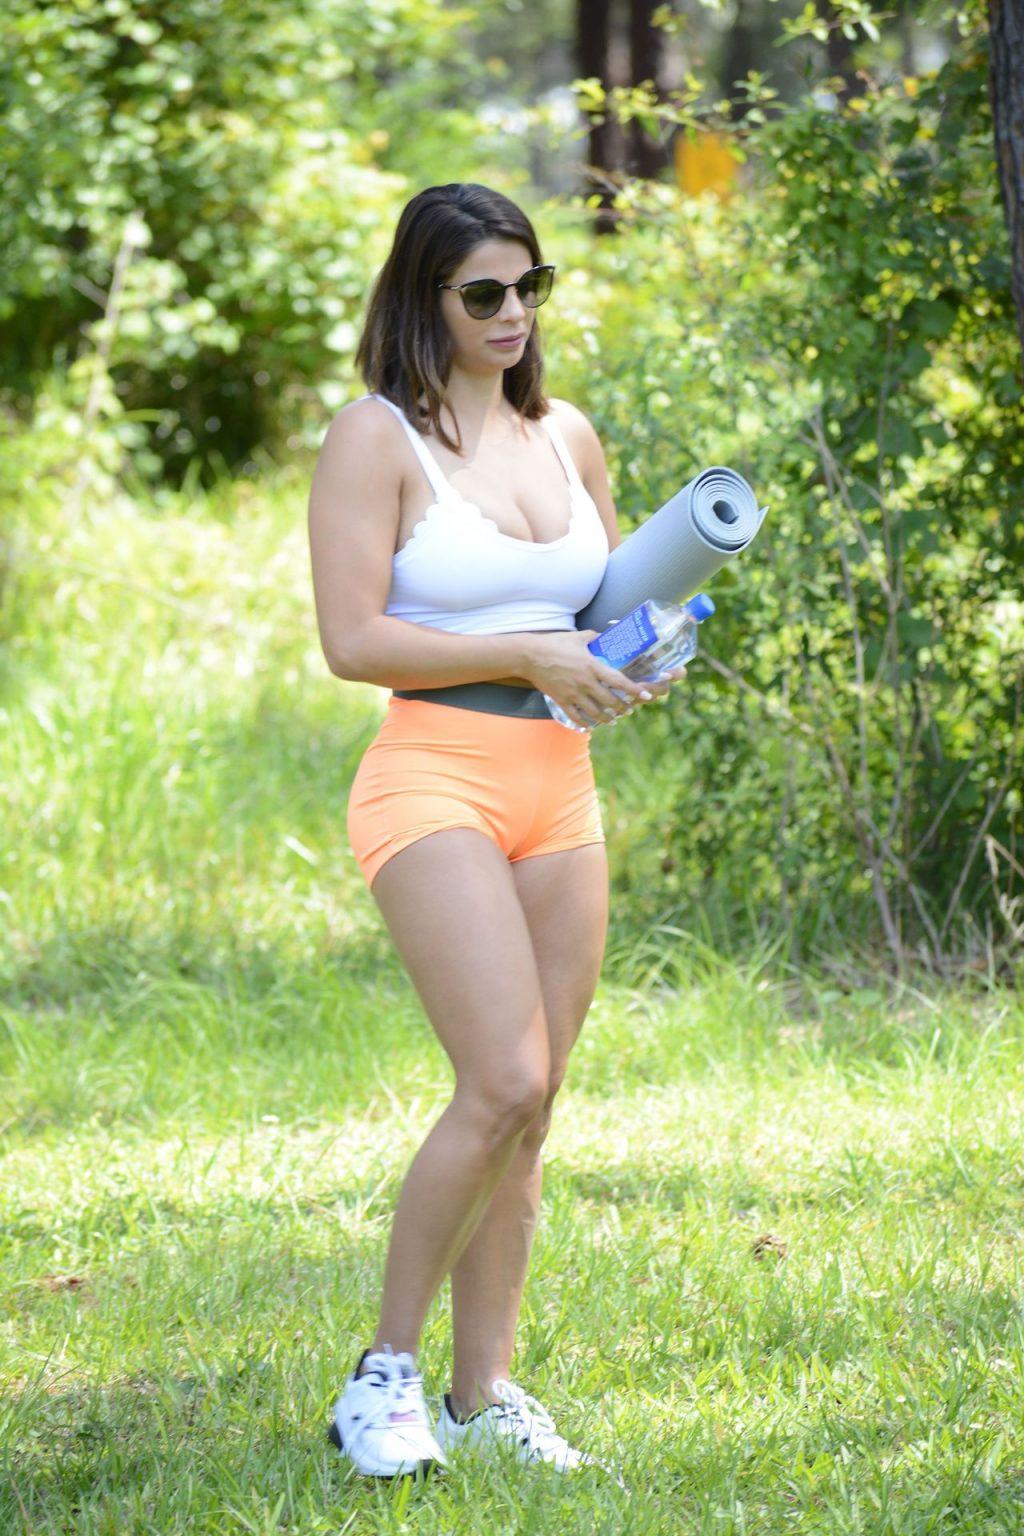 Carmen Valentina & Donna Bella Can Go to the Parks Now (28 Photos)